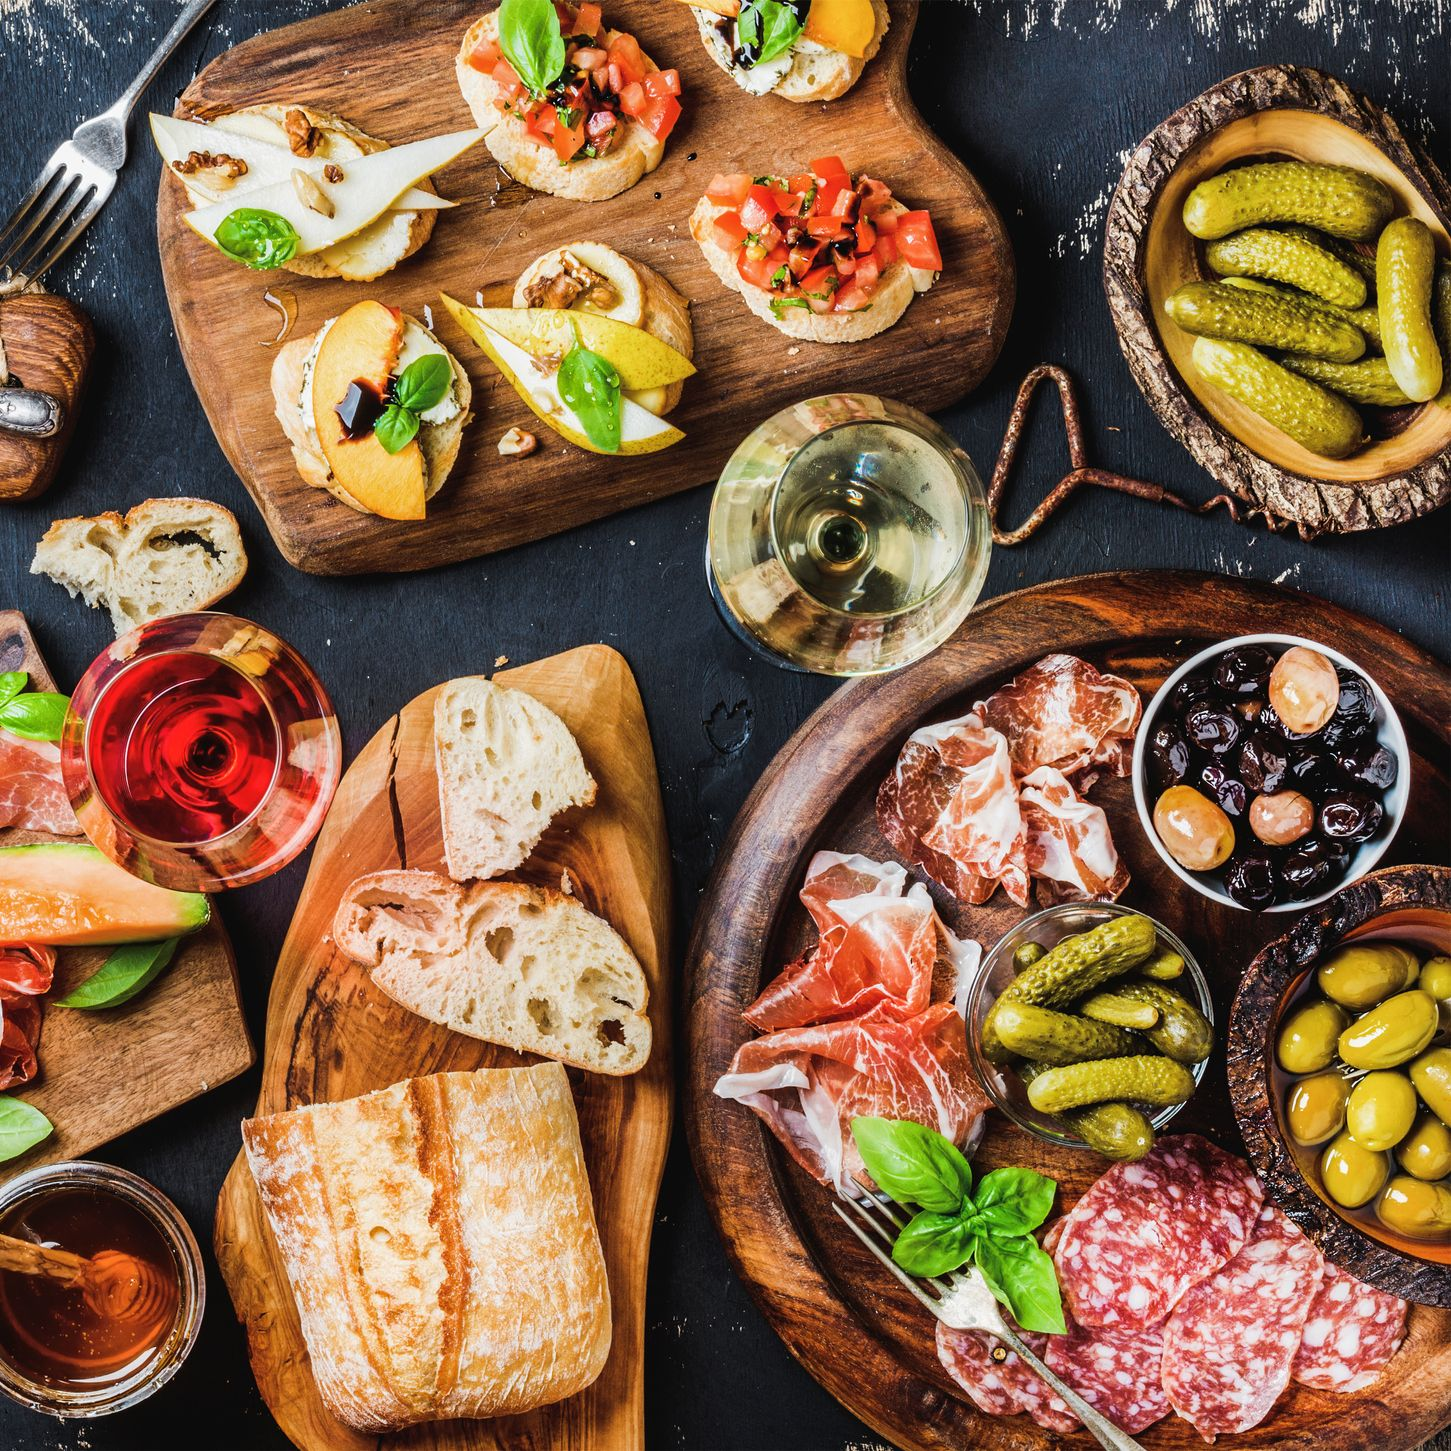 Italian antipasti wine snacks set over black grunge background